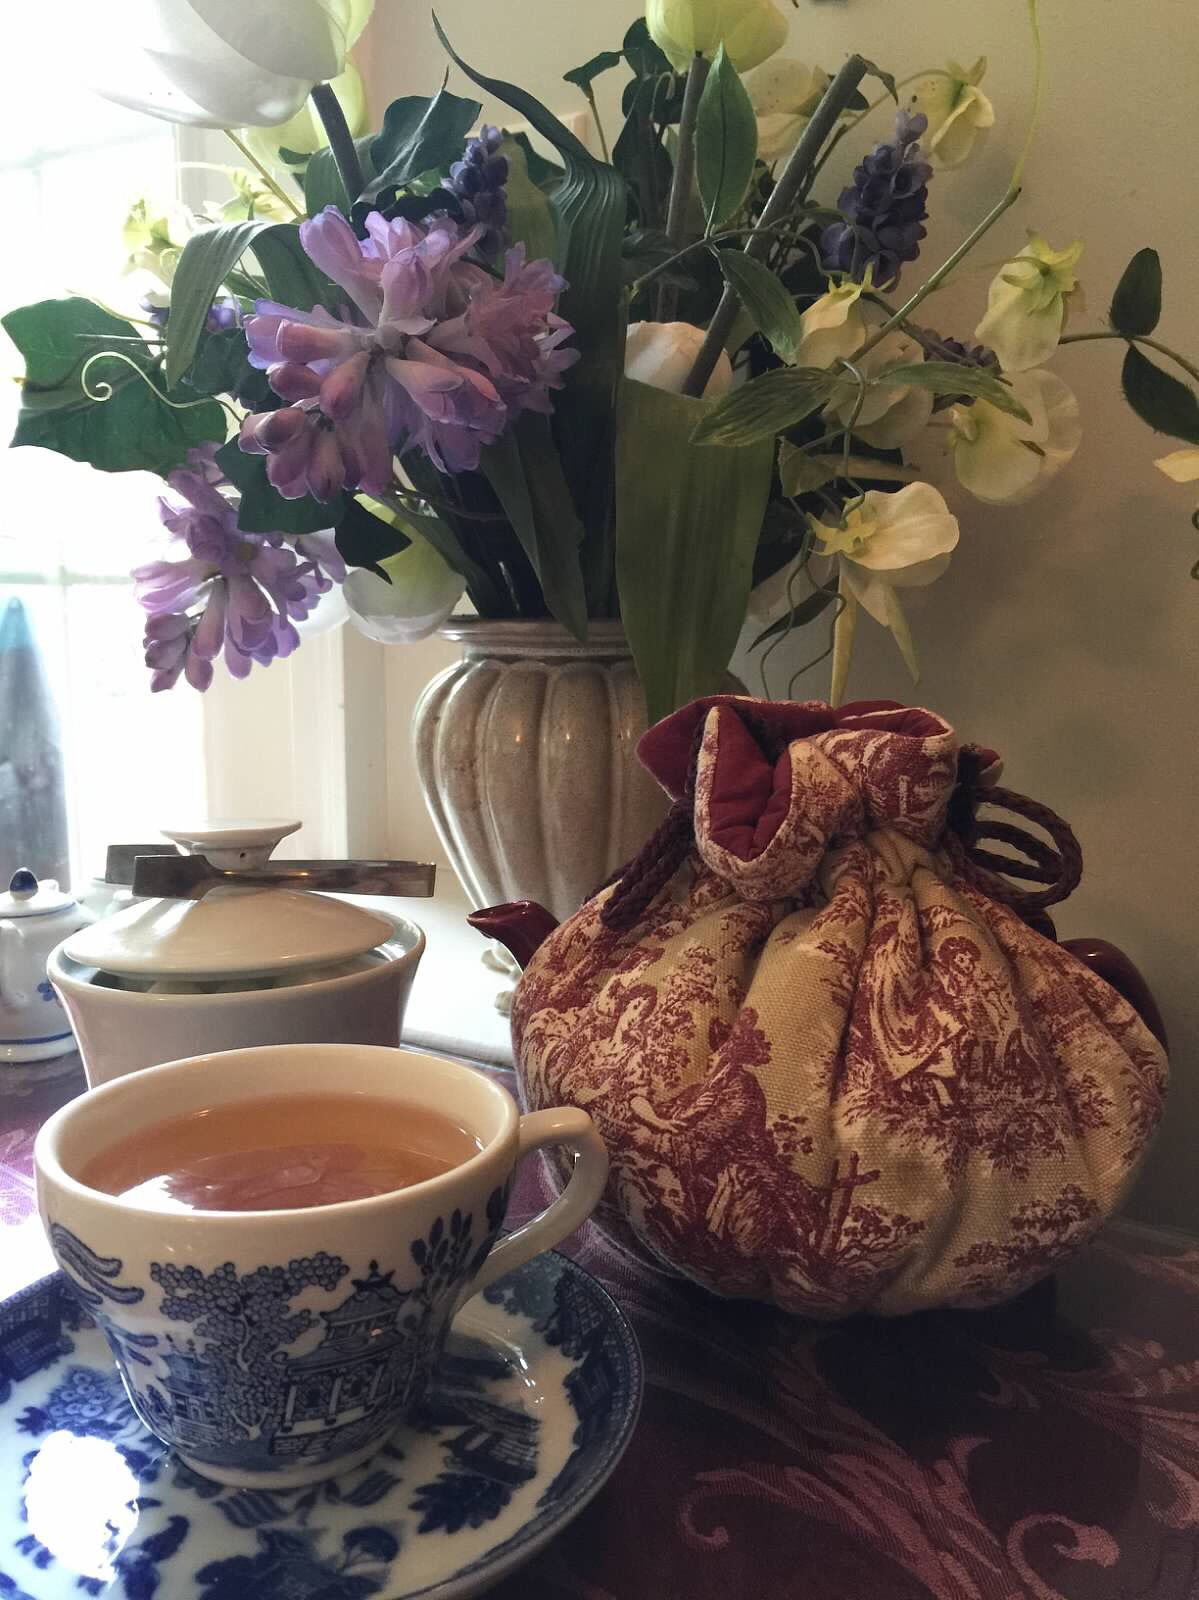 The Dunbar Tea Room, Sandwich, Massachusetts. Photo by